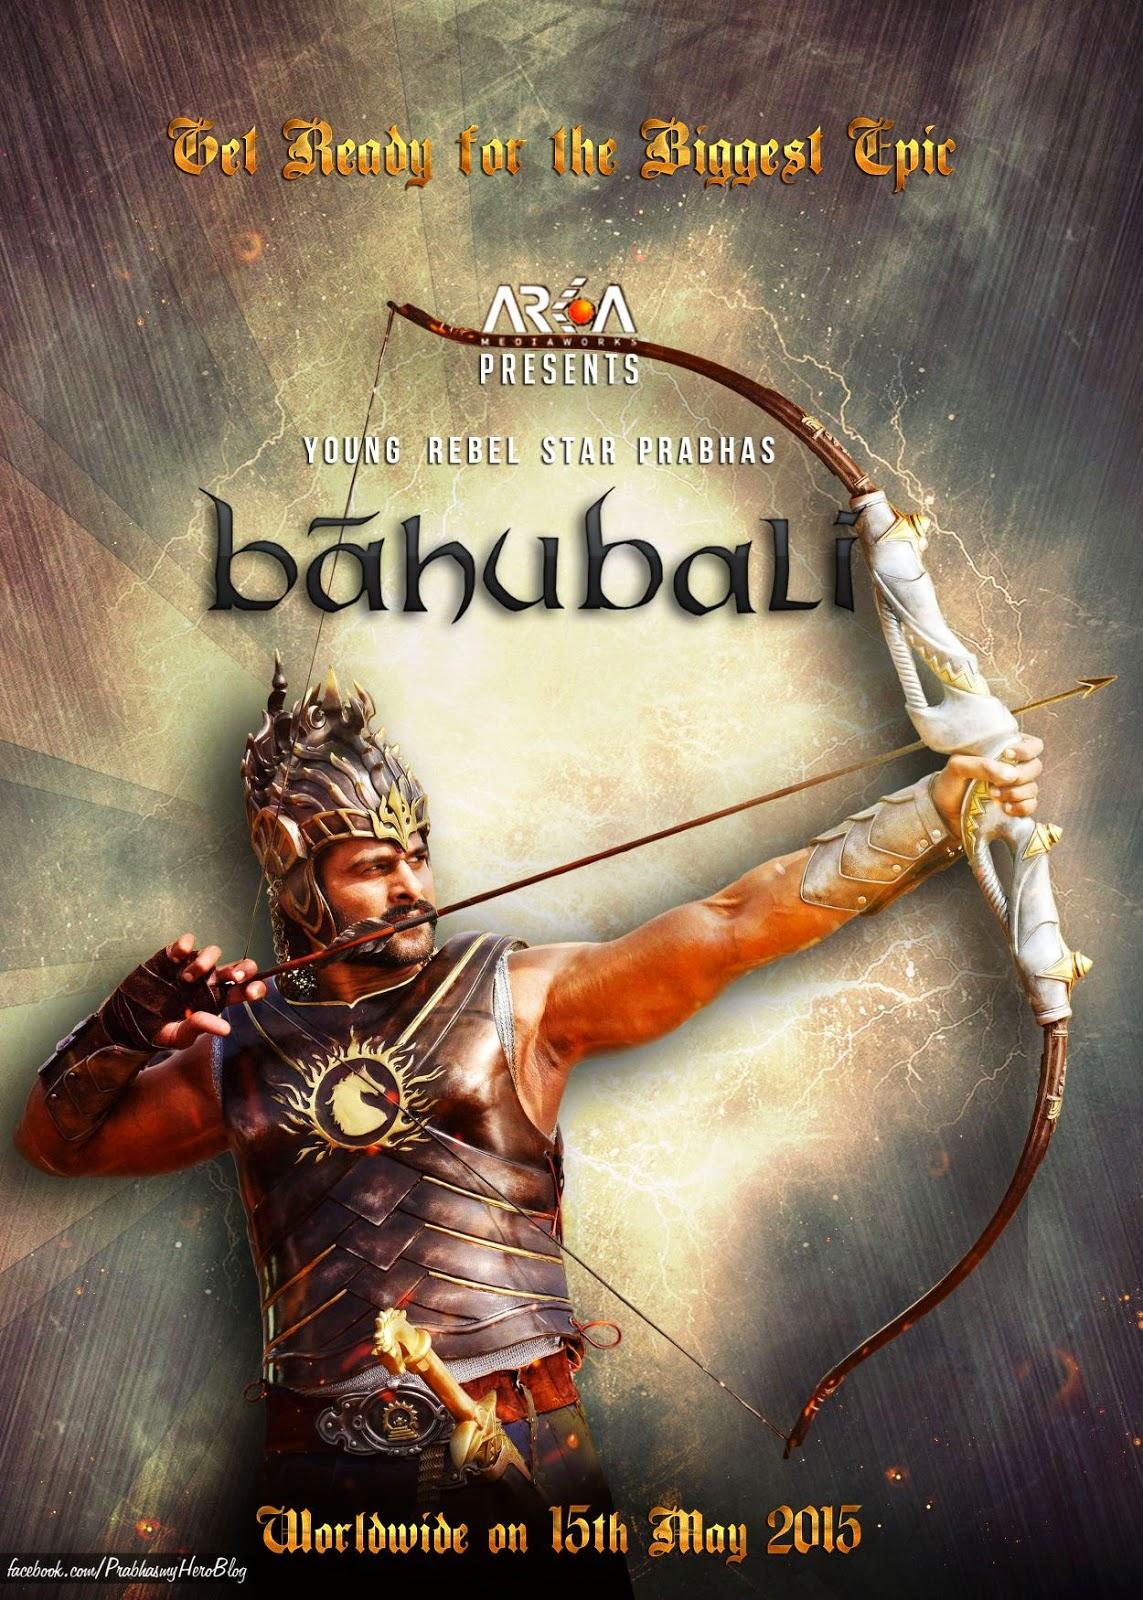 PrabhasMyHero Blog: Baahubali - A masterpiece in the making